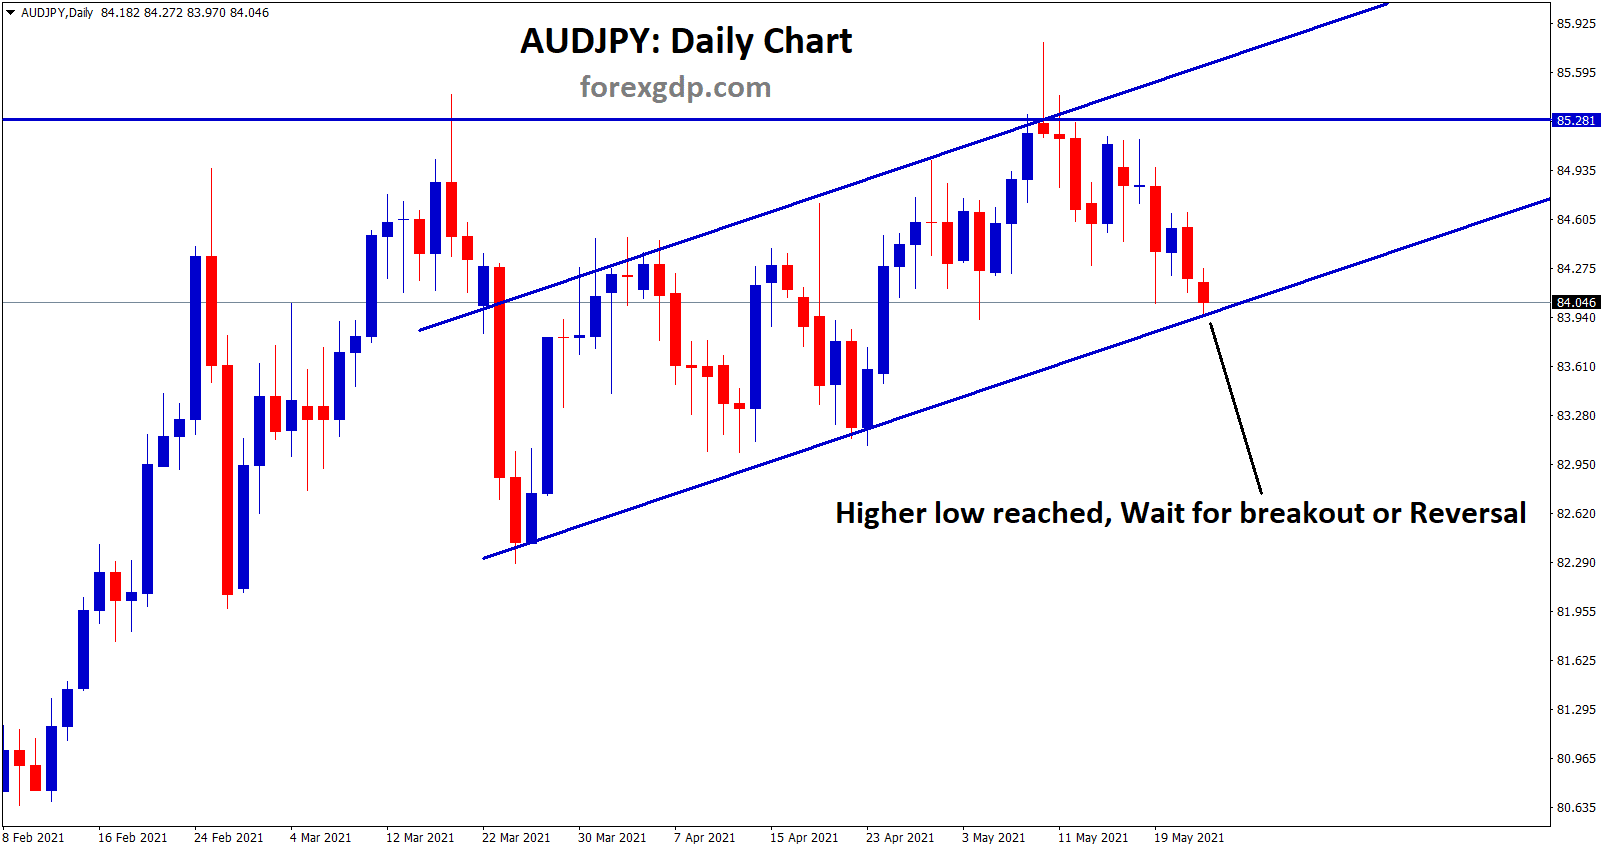 audjpy higher low reached wait for breakout or reversal